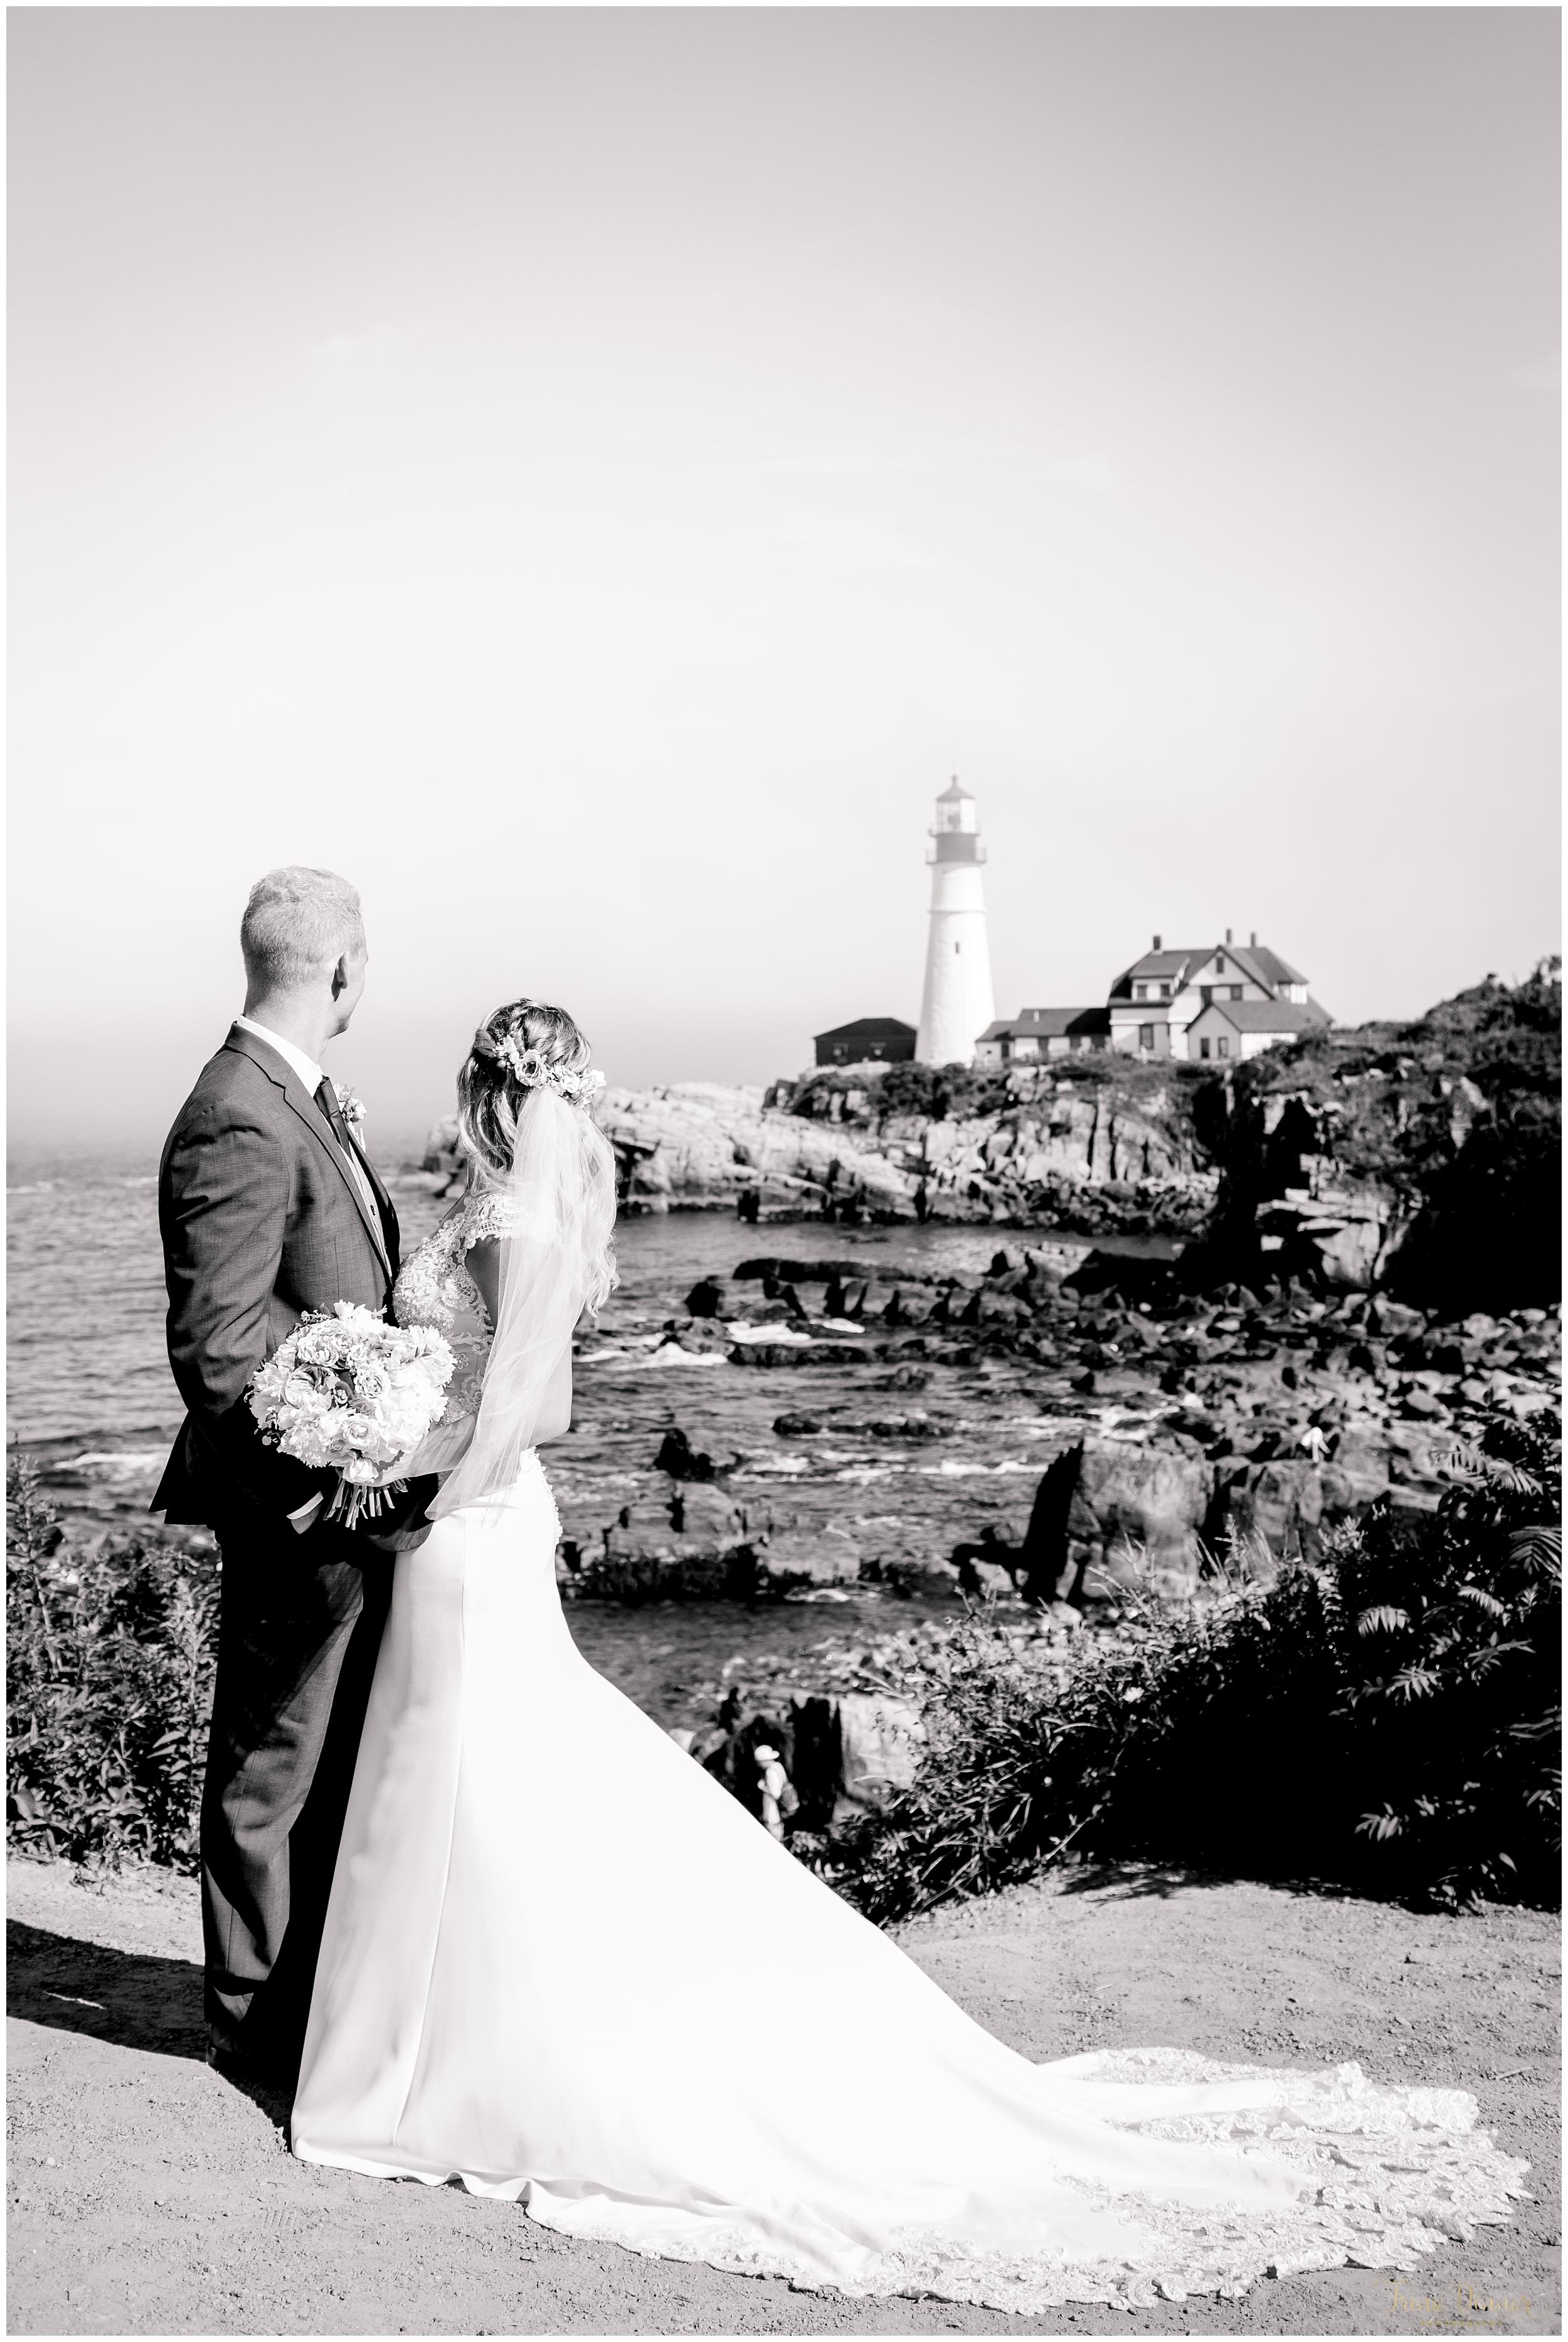 Cape Elizabeth Maine Wedding Scene with Bride and Groom looking at Portland Headlight